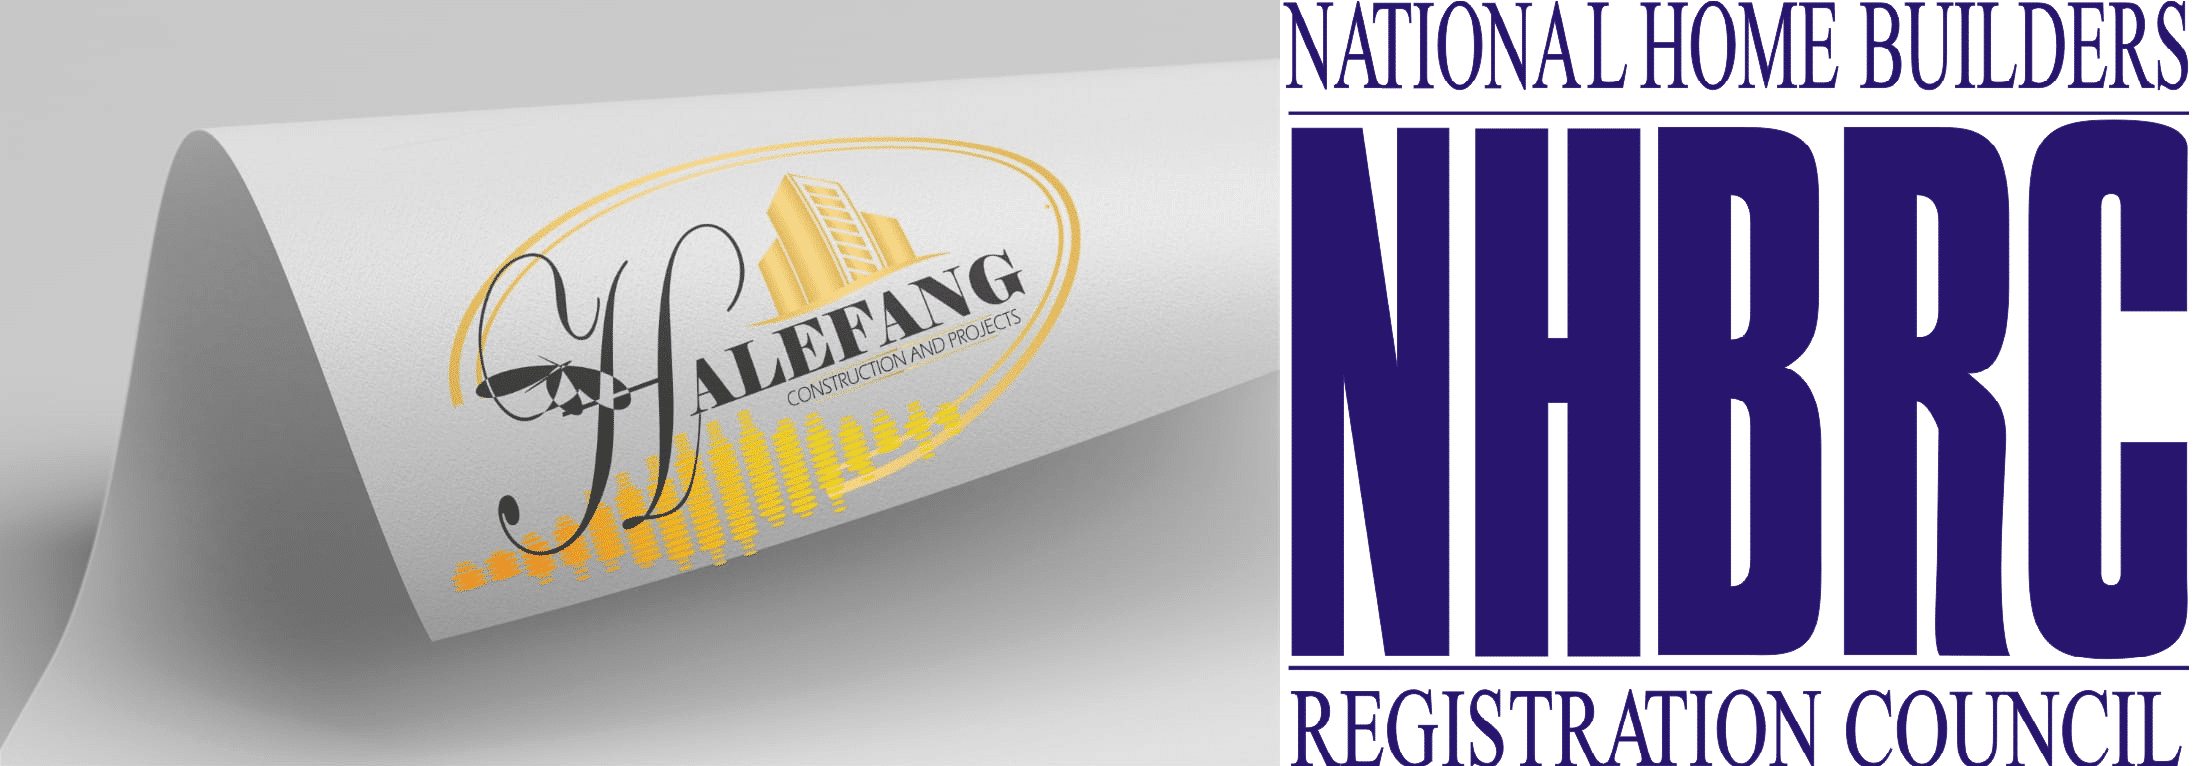 Halefang Projects